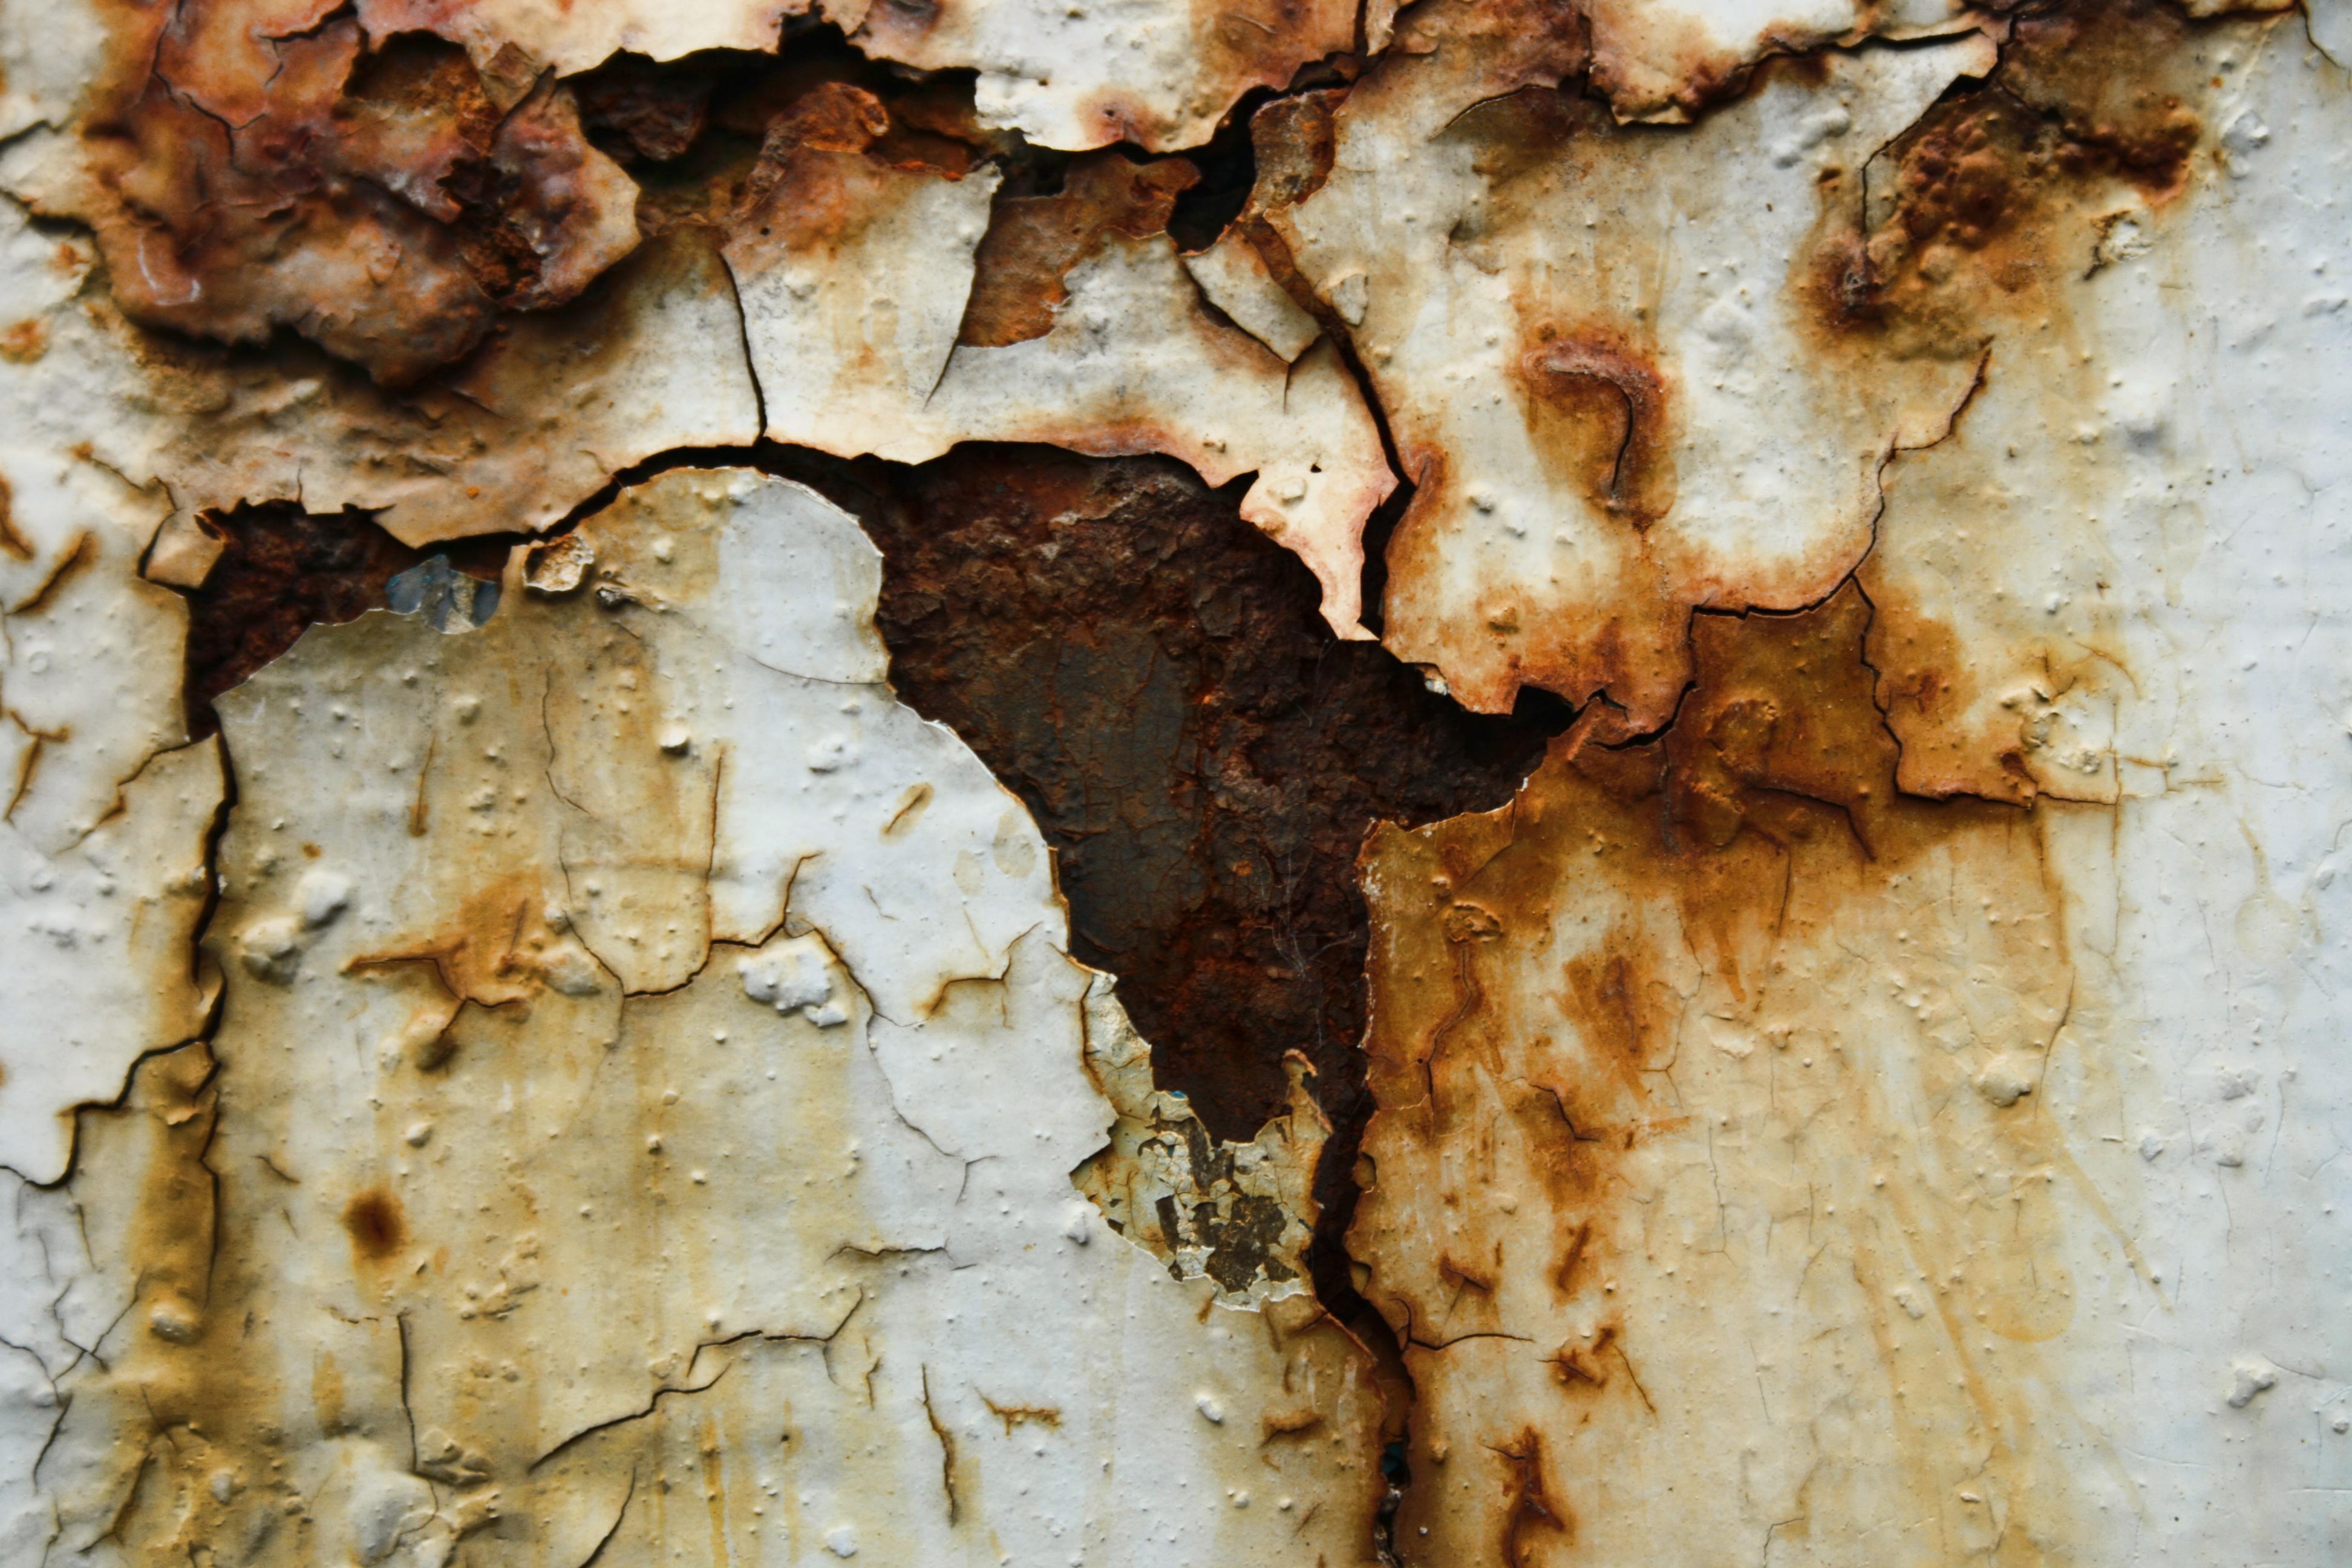 Rusty metal photo